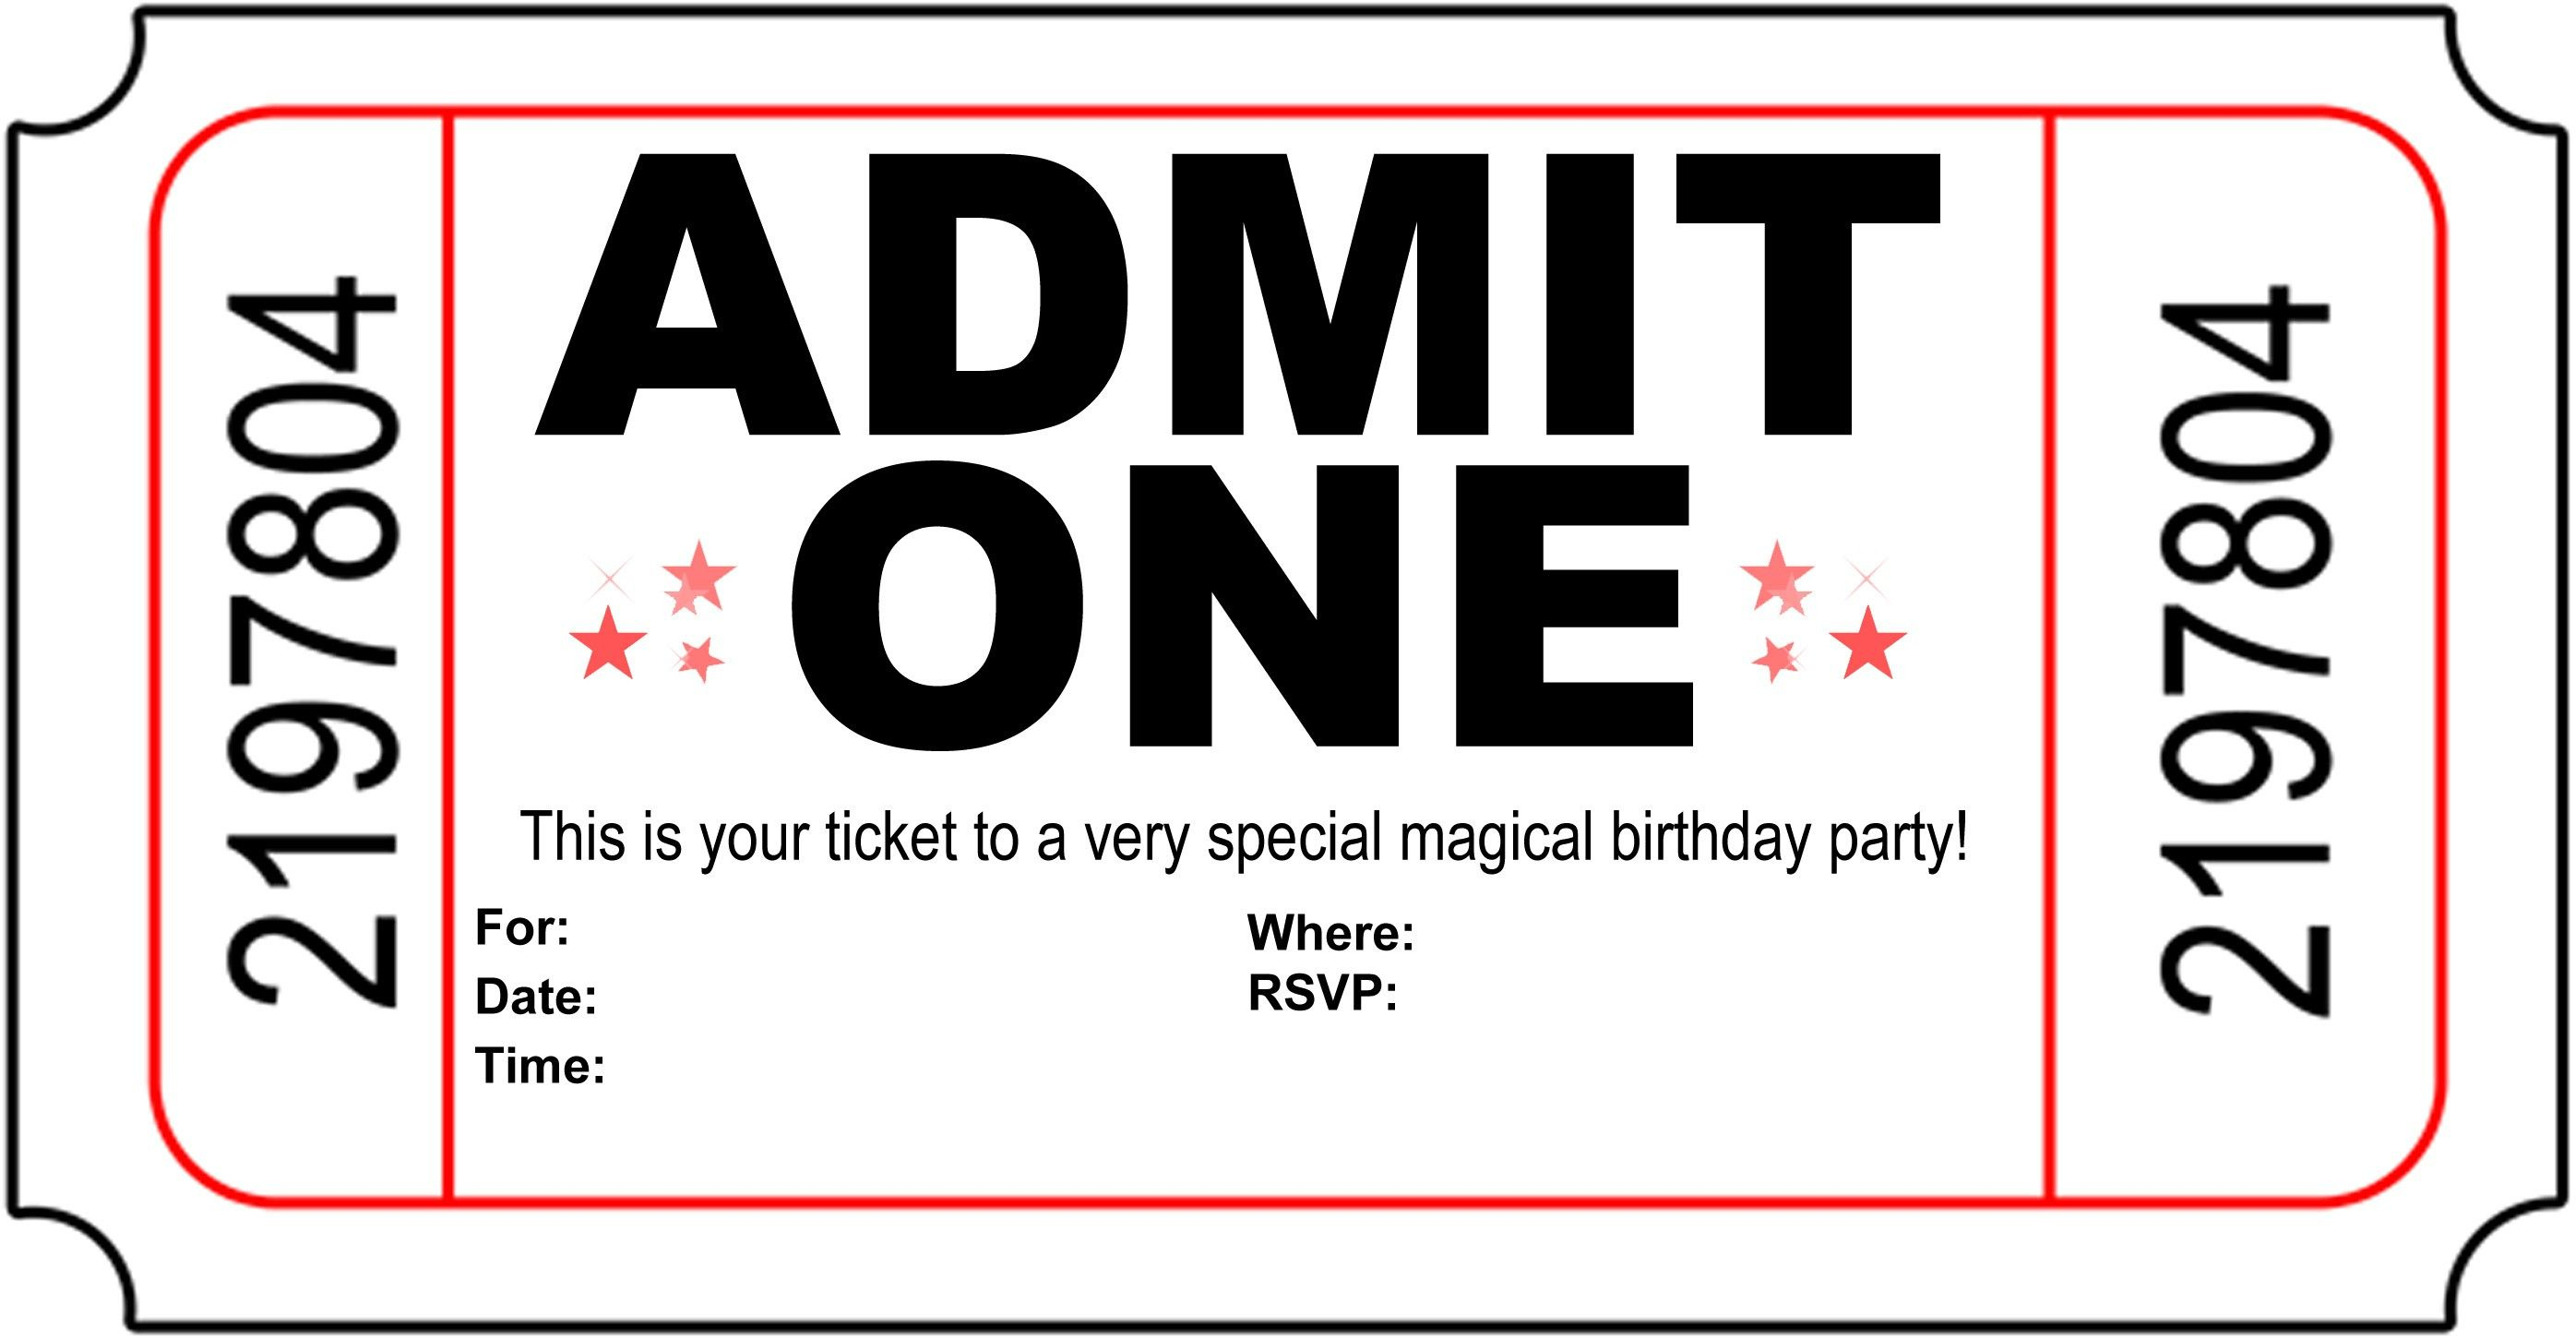 Birthday Party Invitation Free Printable   Printshop.   Pinterest - Free Printable Movie Themed Invitations